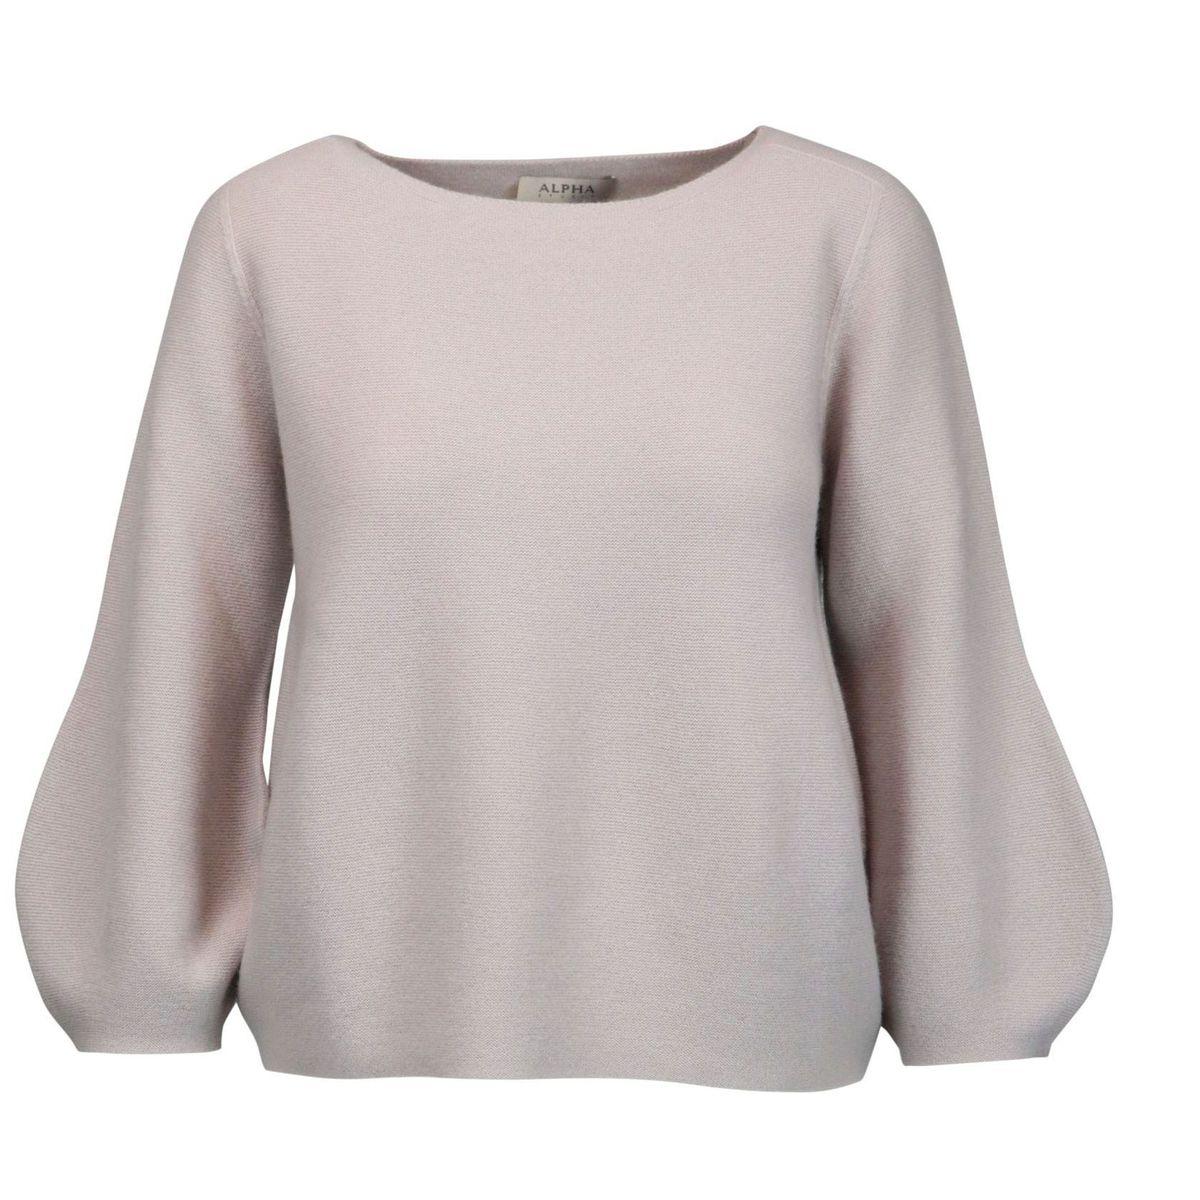 Boat neck cashmere sweater Ice Alpha Studio